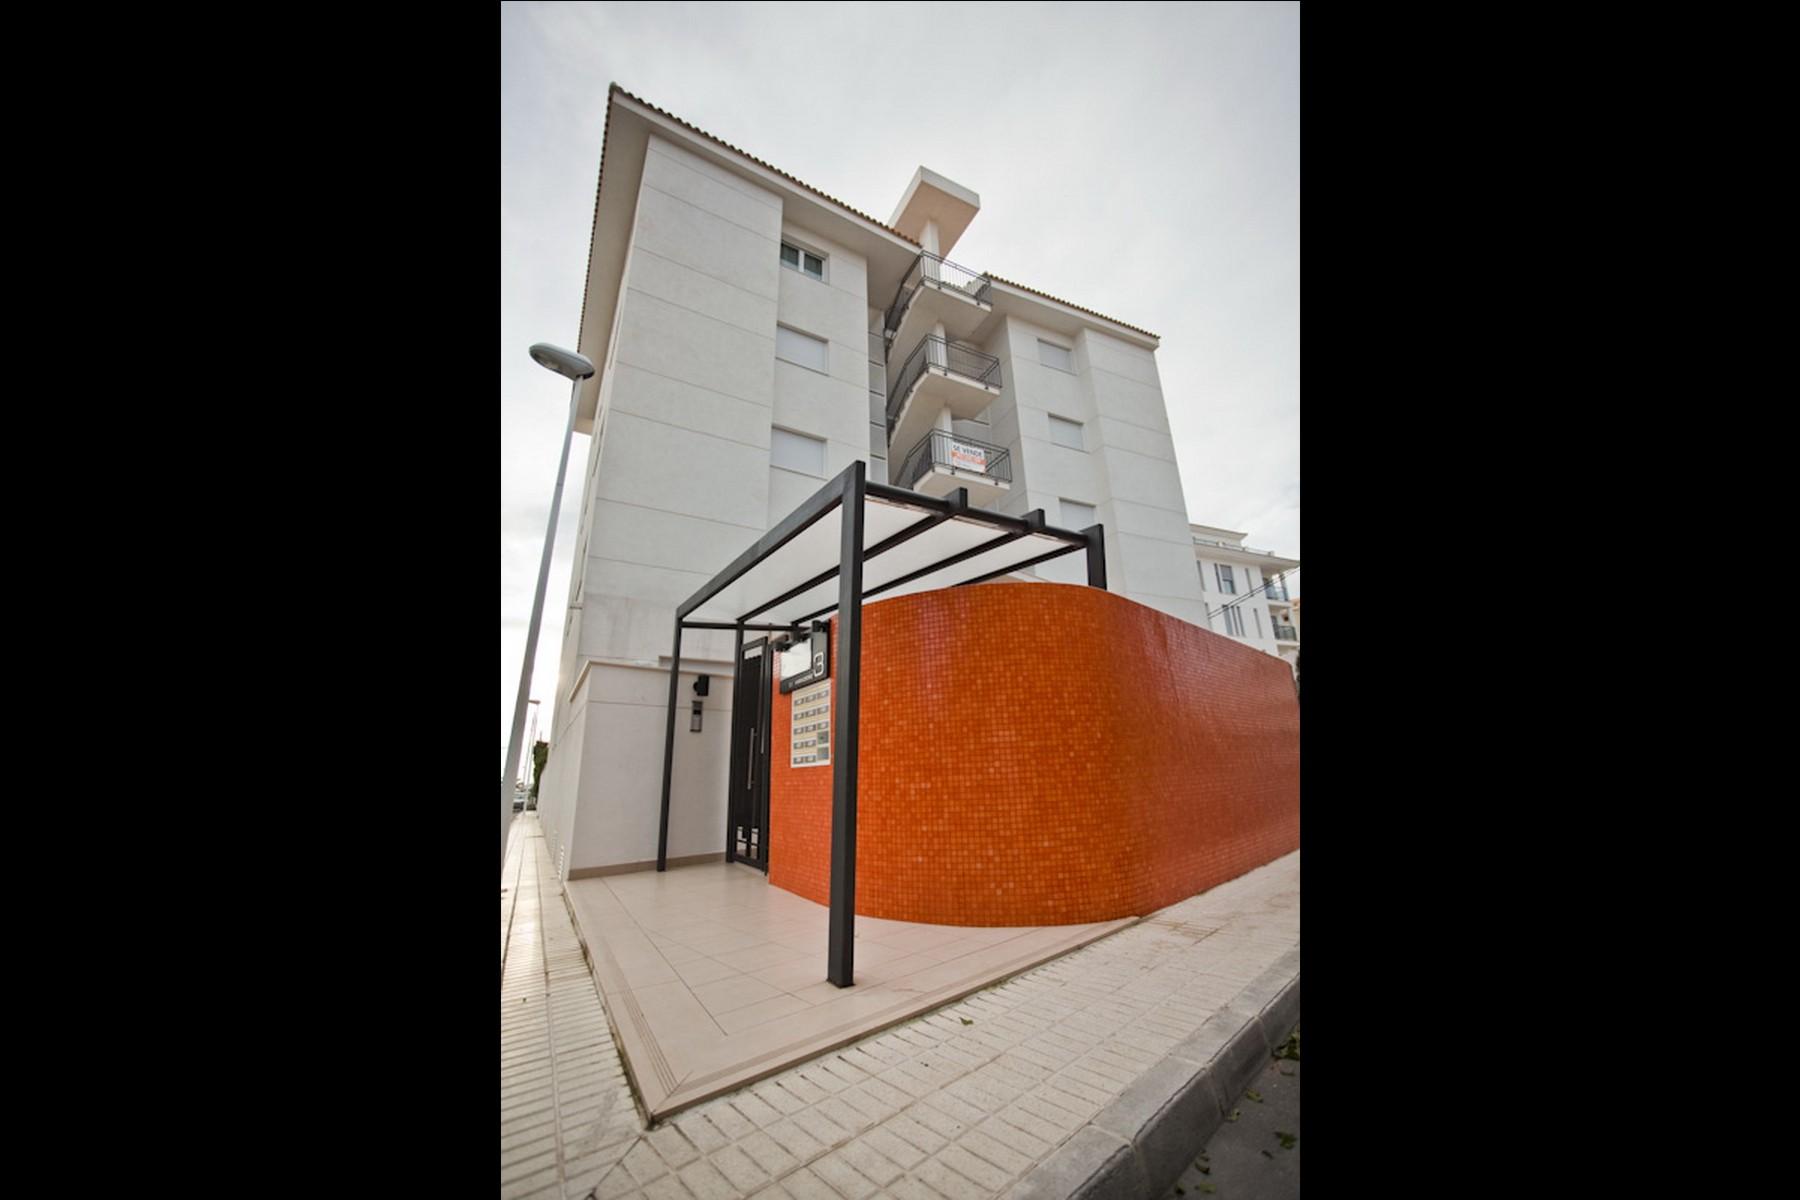 Imaginarq-155-Edificio-Viviendas-Altea-Alicante-01A